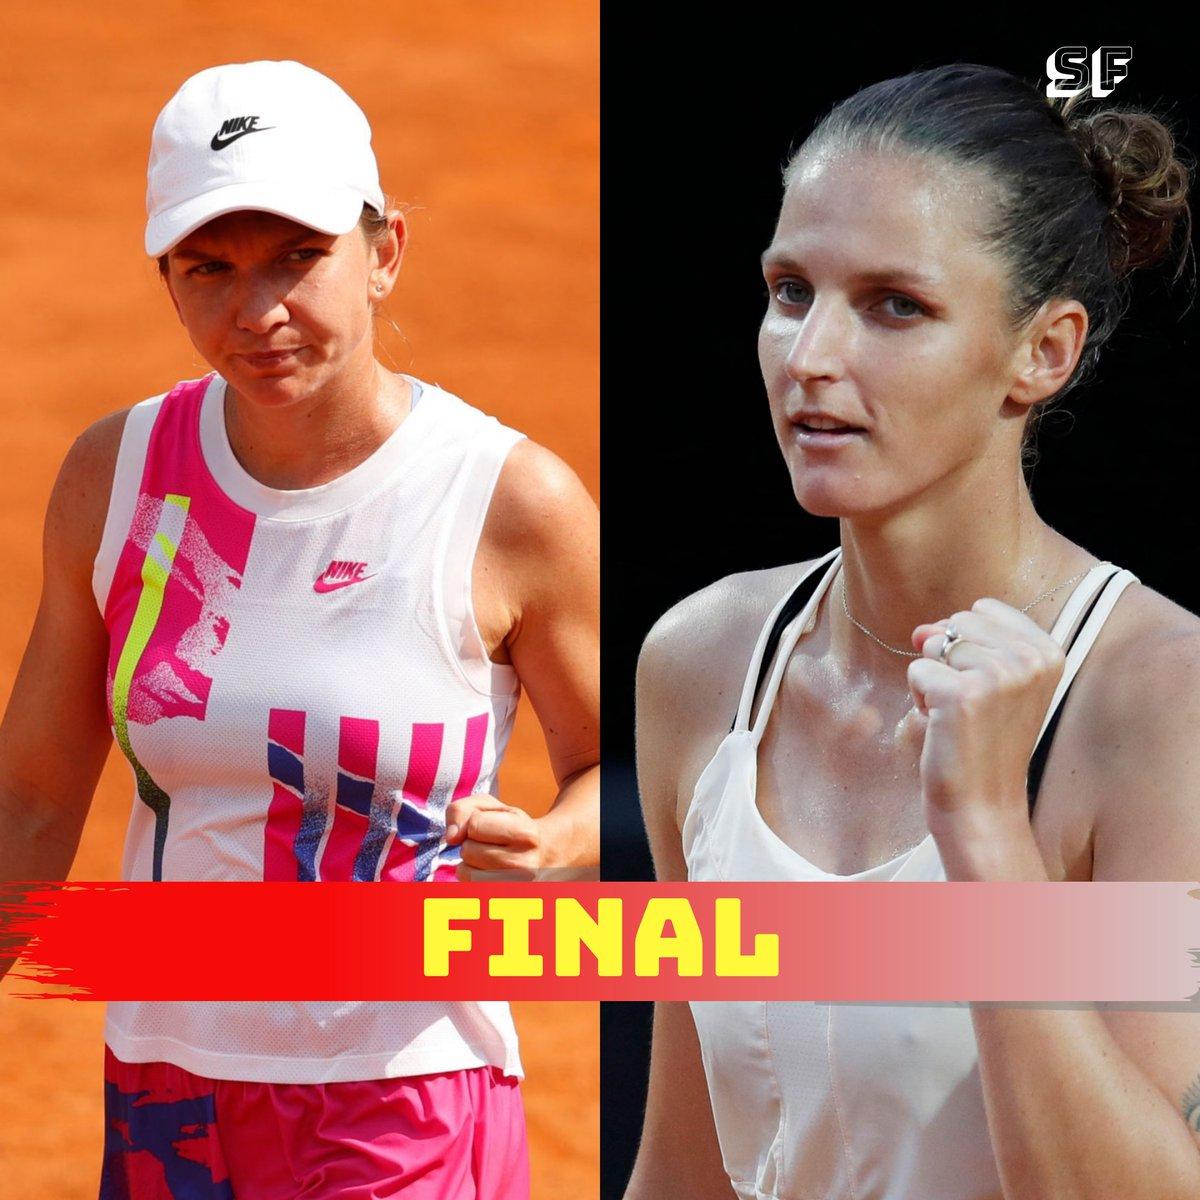 Top seed 🇷🇴 Halep to meet Depending Champion  🇨🇿 Karolina Pliskova in Italian Open title clash  #IBI20 #Tennis https://t.co/OaP7ZVwCfy